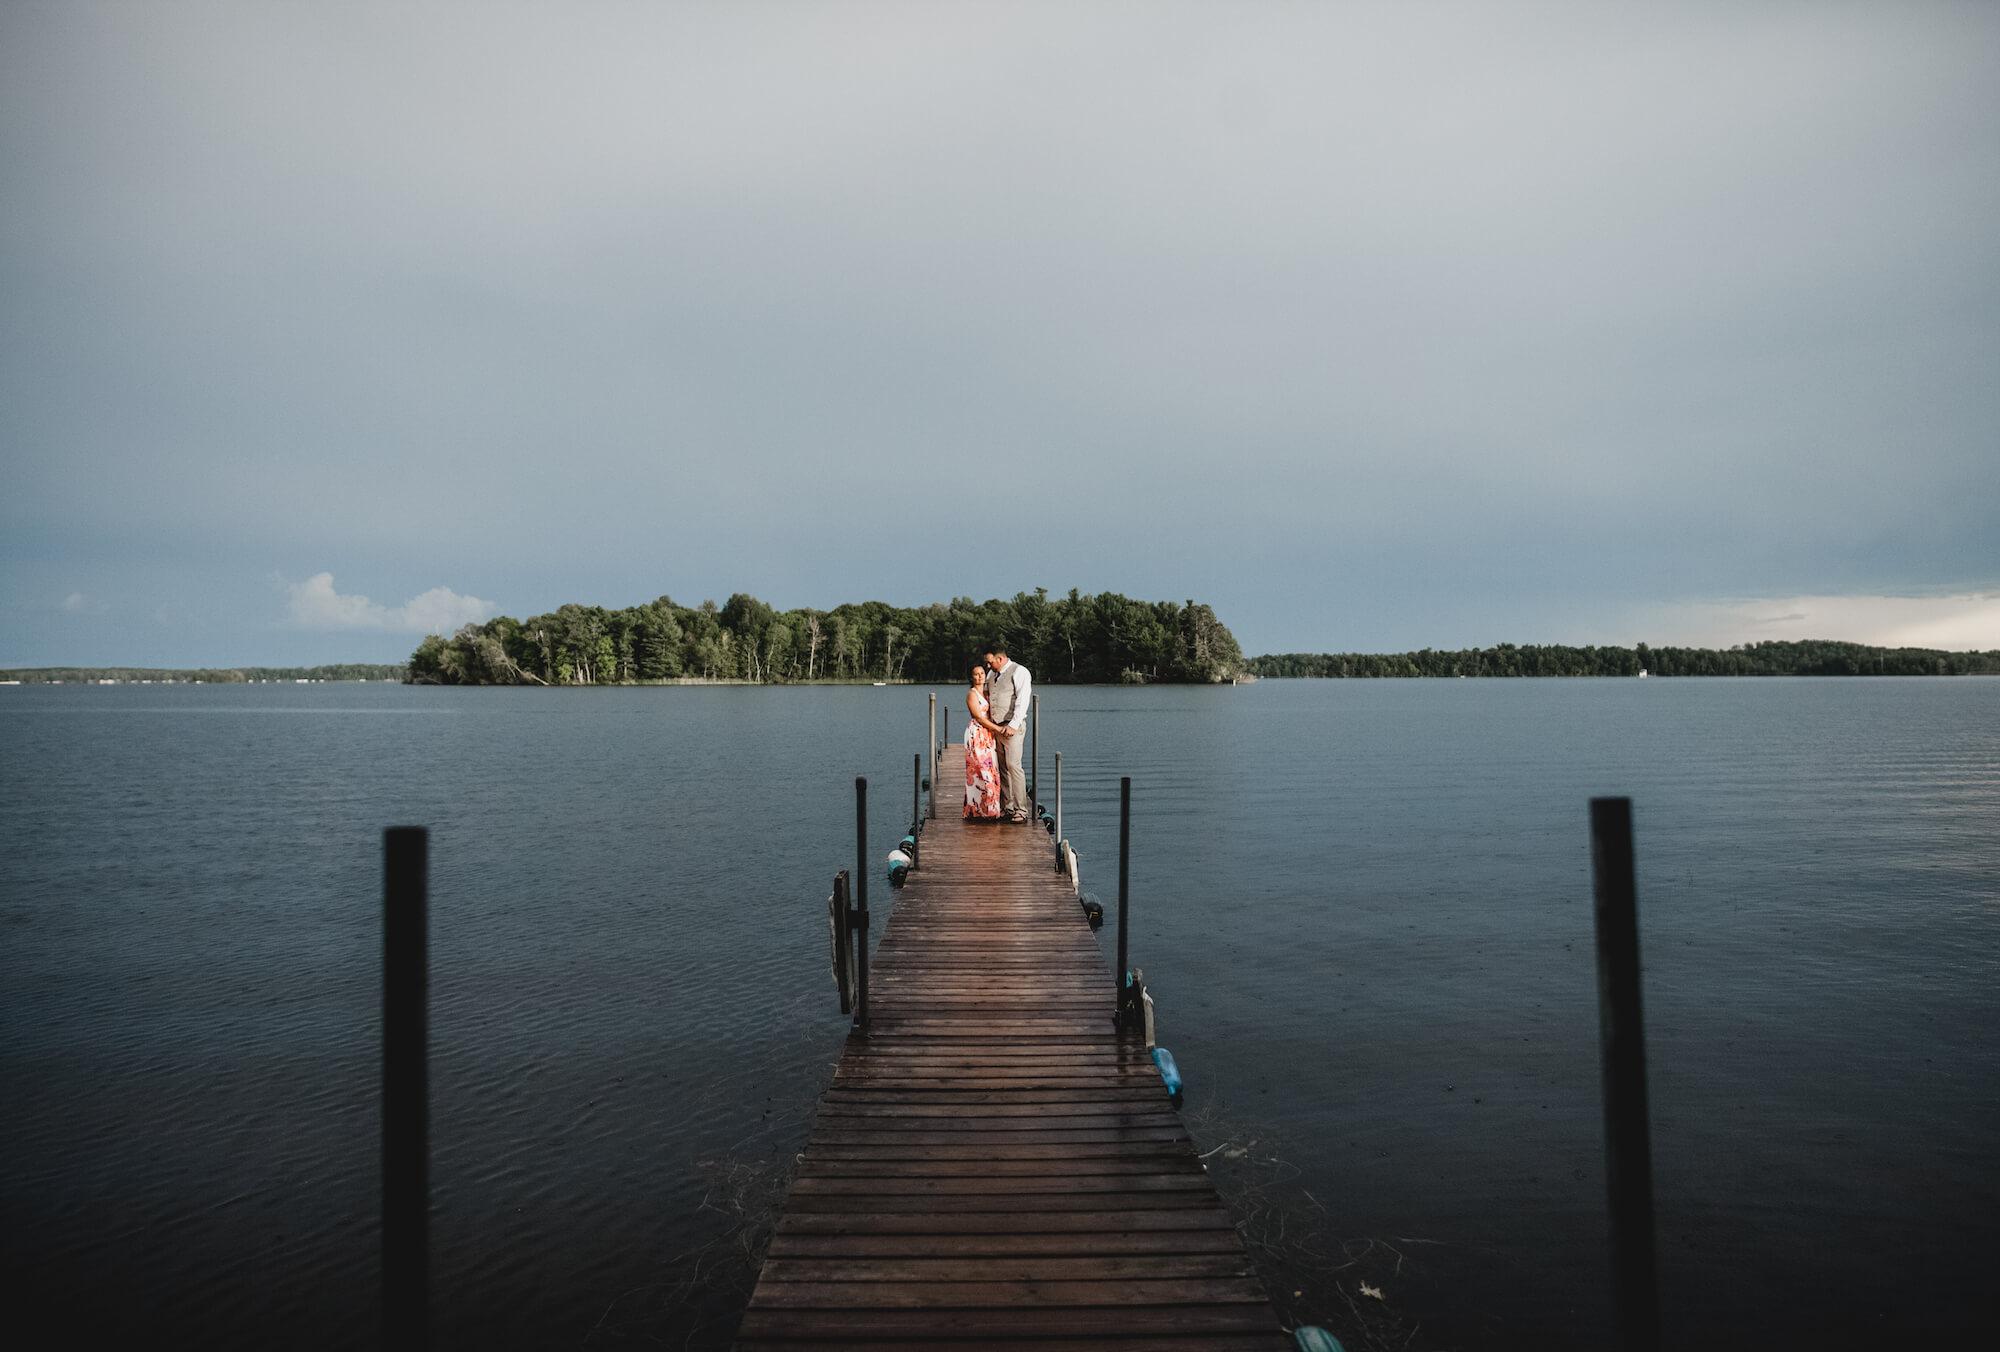 engle-olson-maddy-pat-mn-wedding-photography-53.jpg